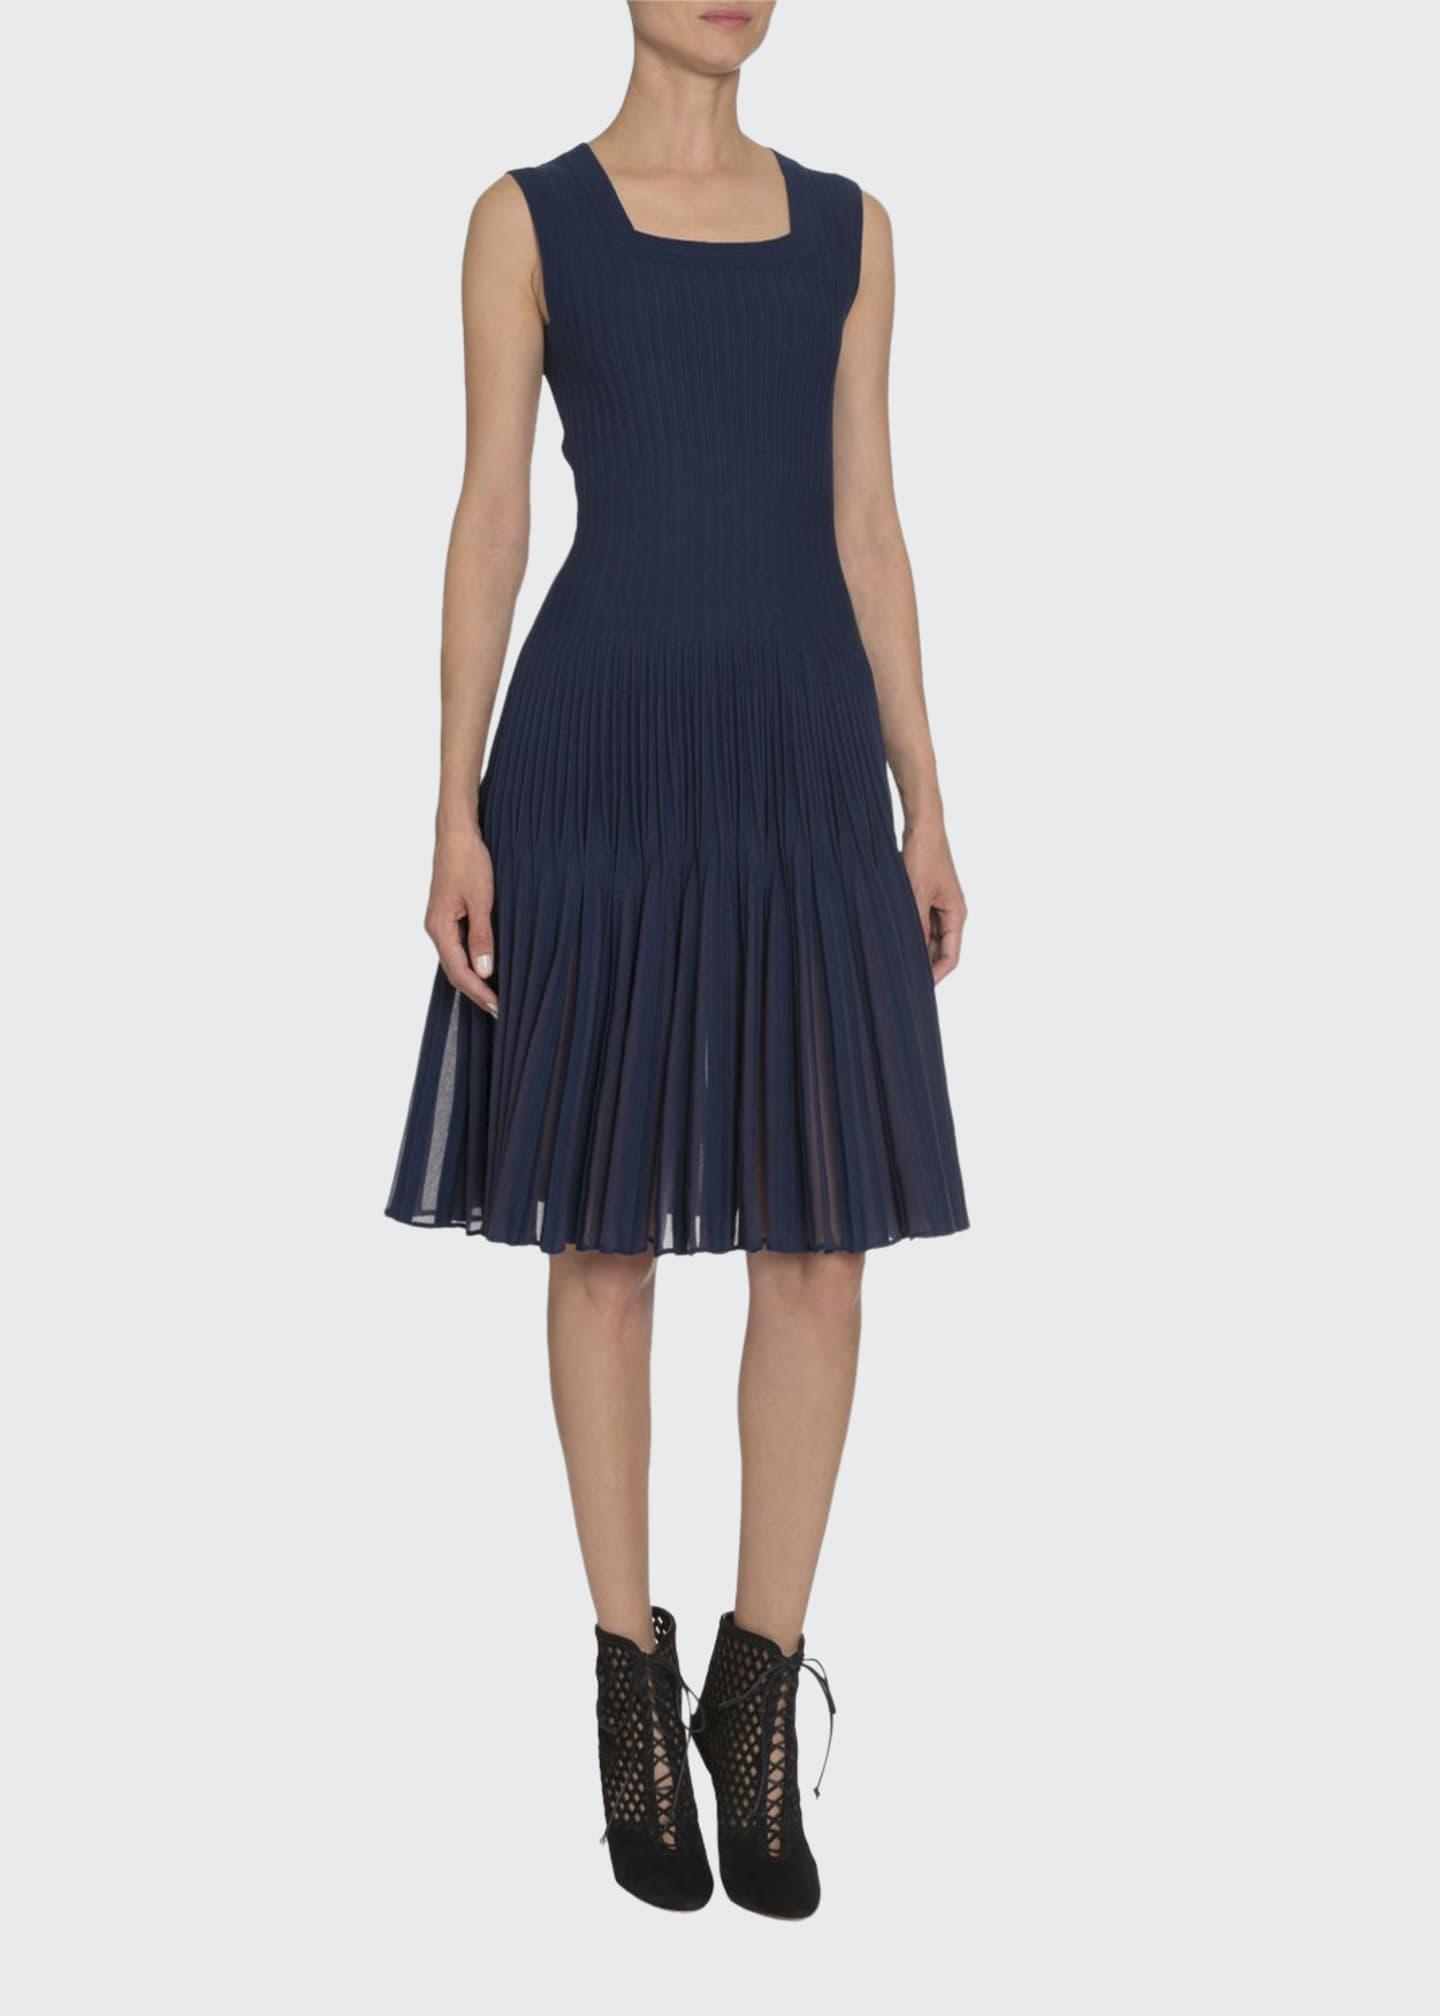 ALAIA Square-Neck Pleated Bottom Dress